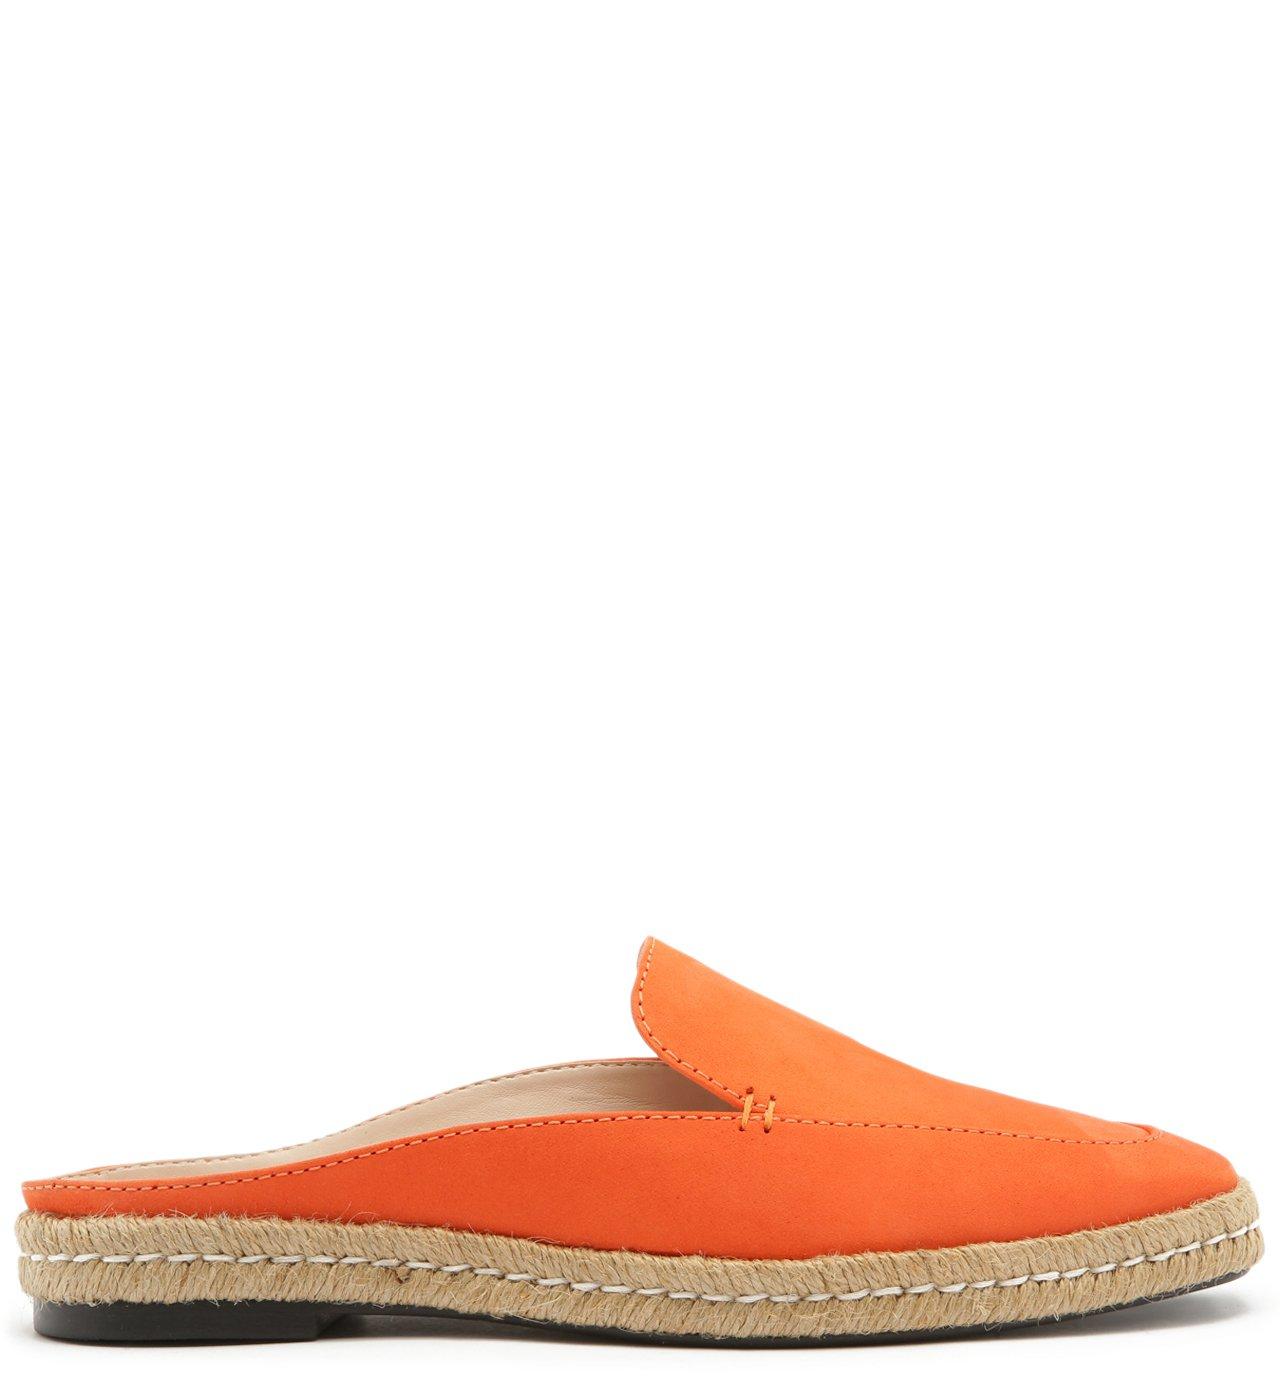 Flat Mule Espadrille Orange | Schutz